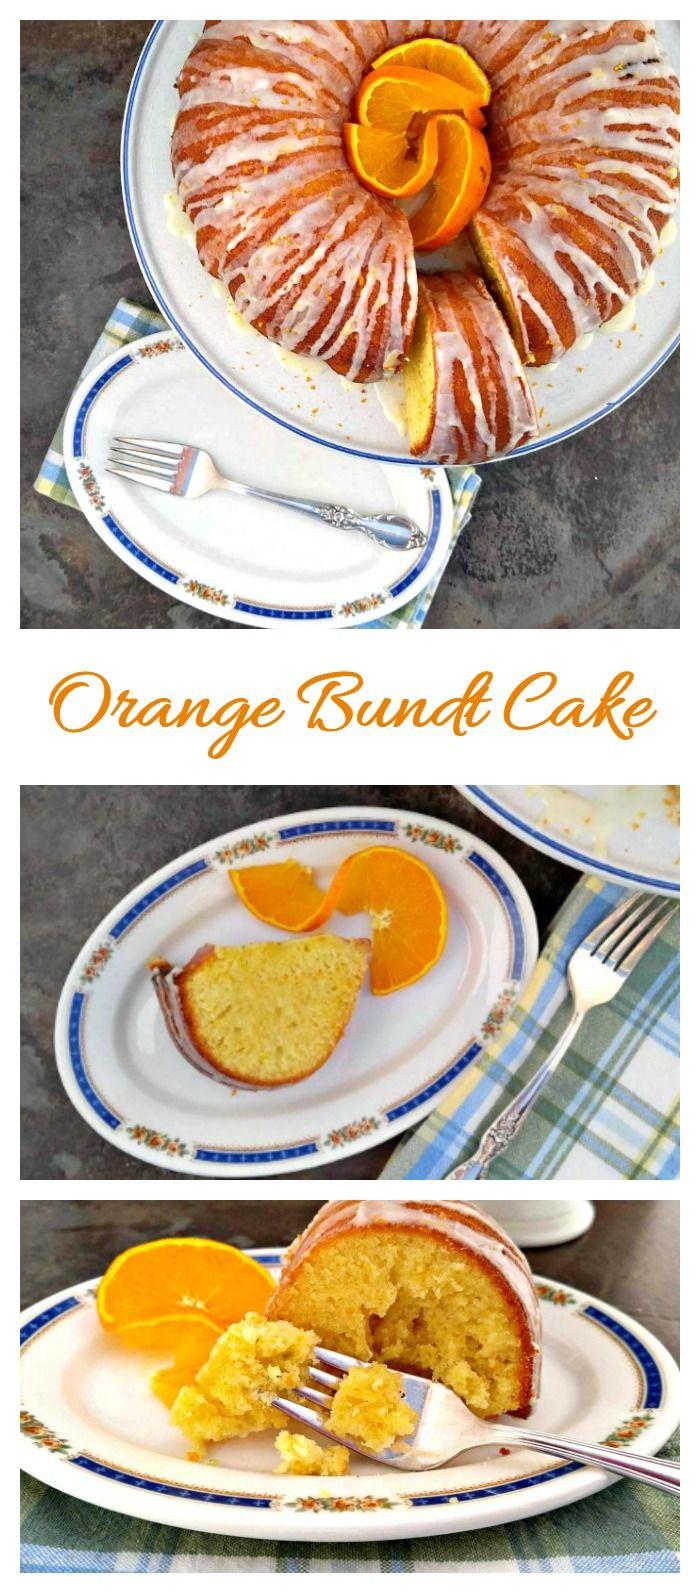 This orange bundt cake has a fresh citrus taste and a creamy orange glaze.